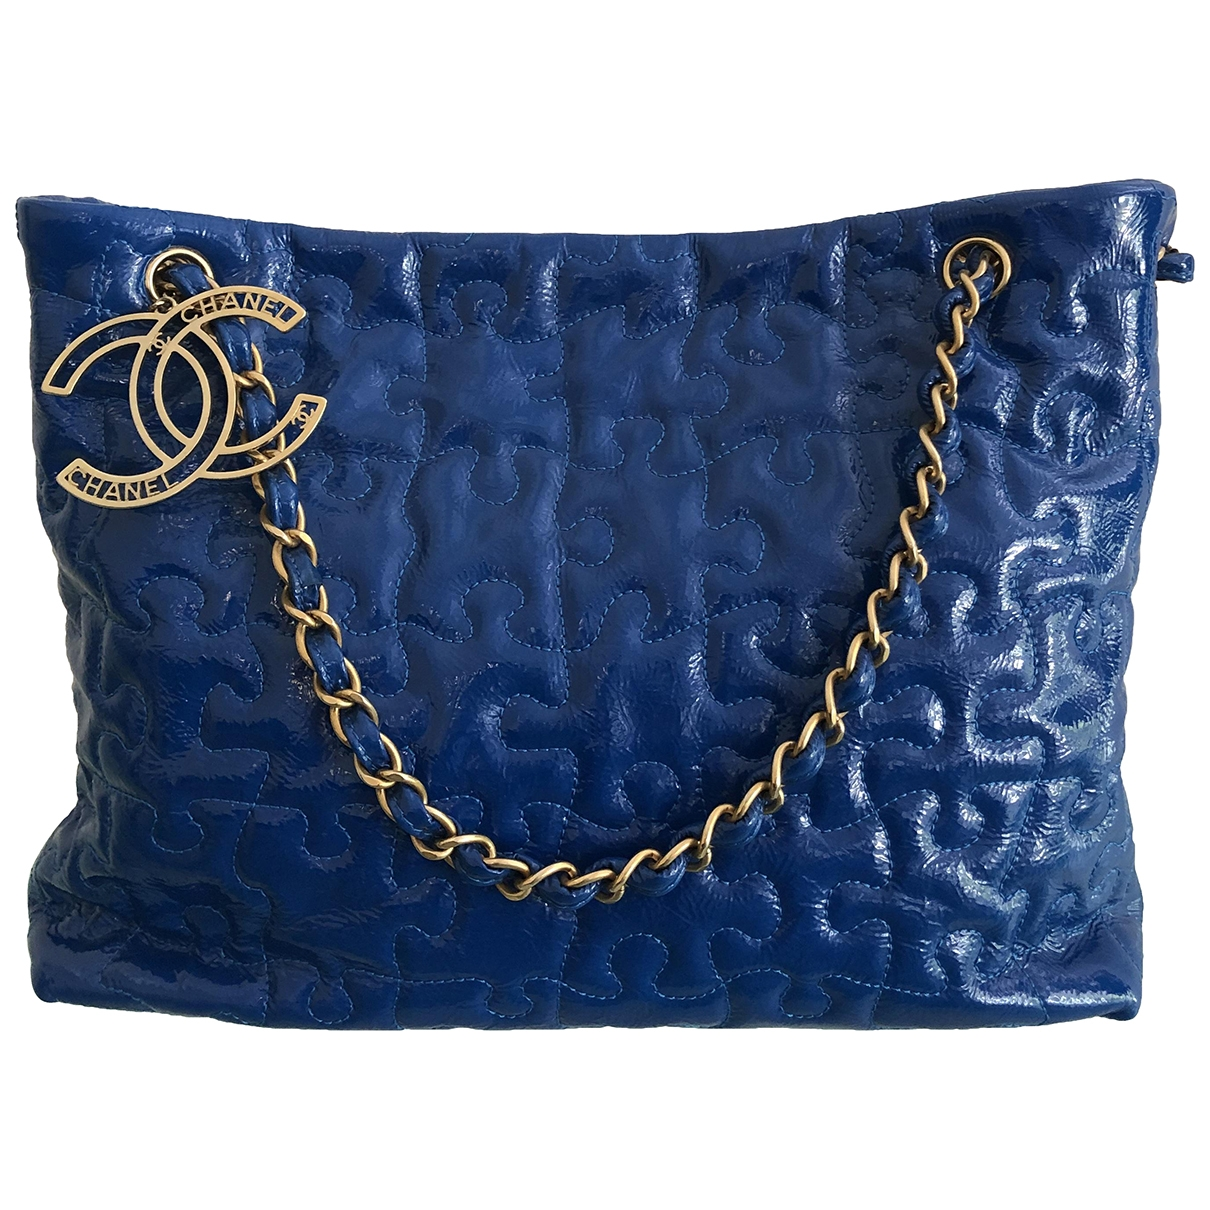 Chanel \N Blue Patent leather handbag for Women \N